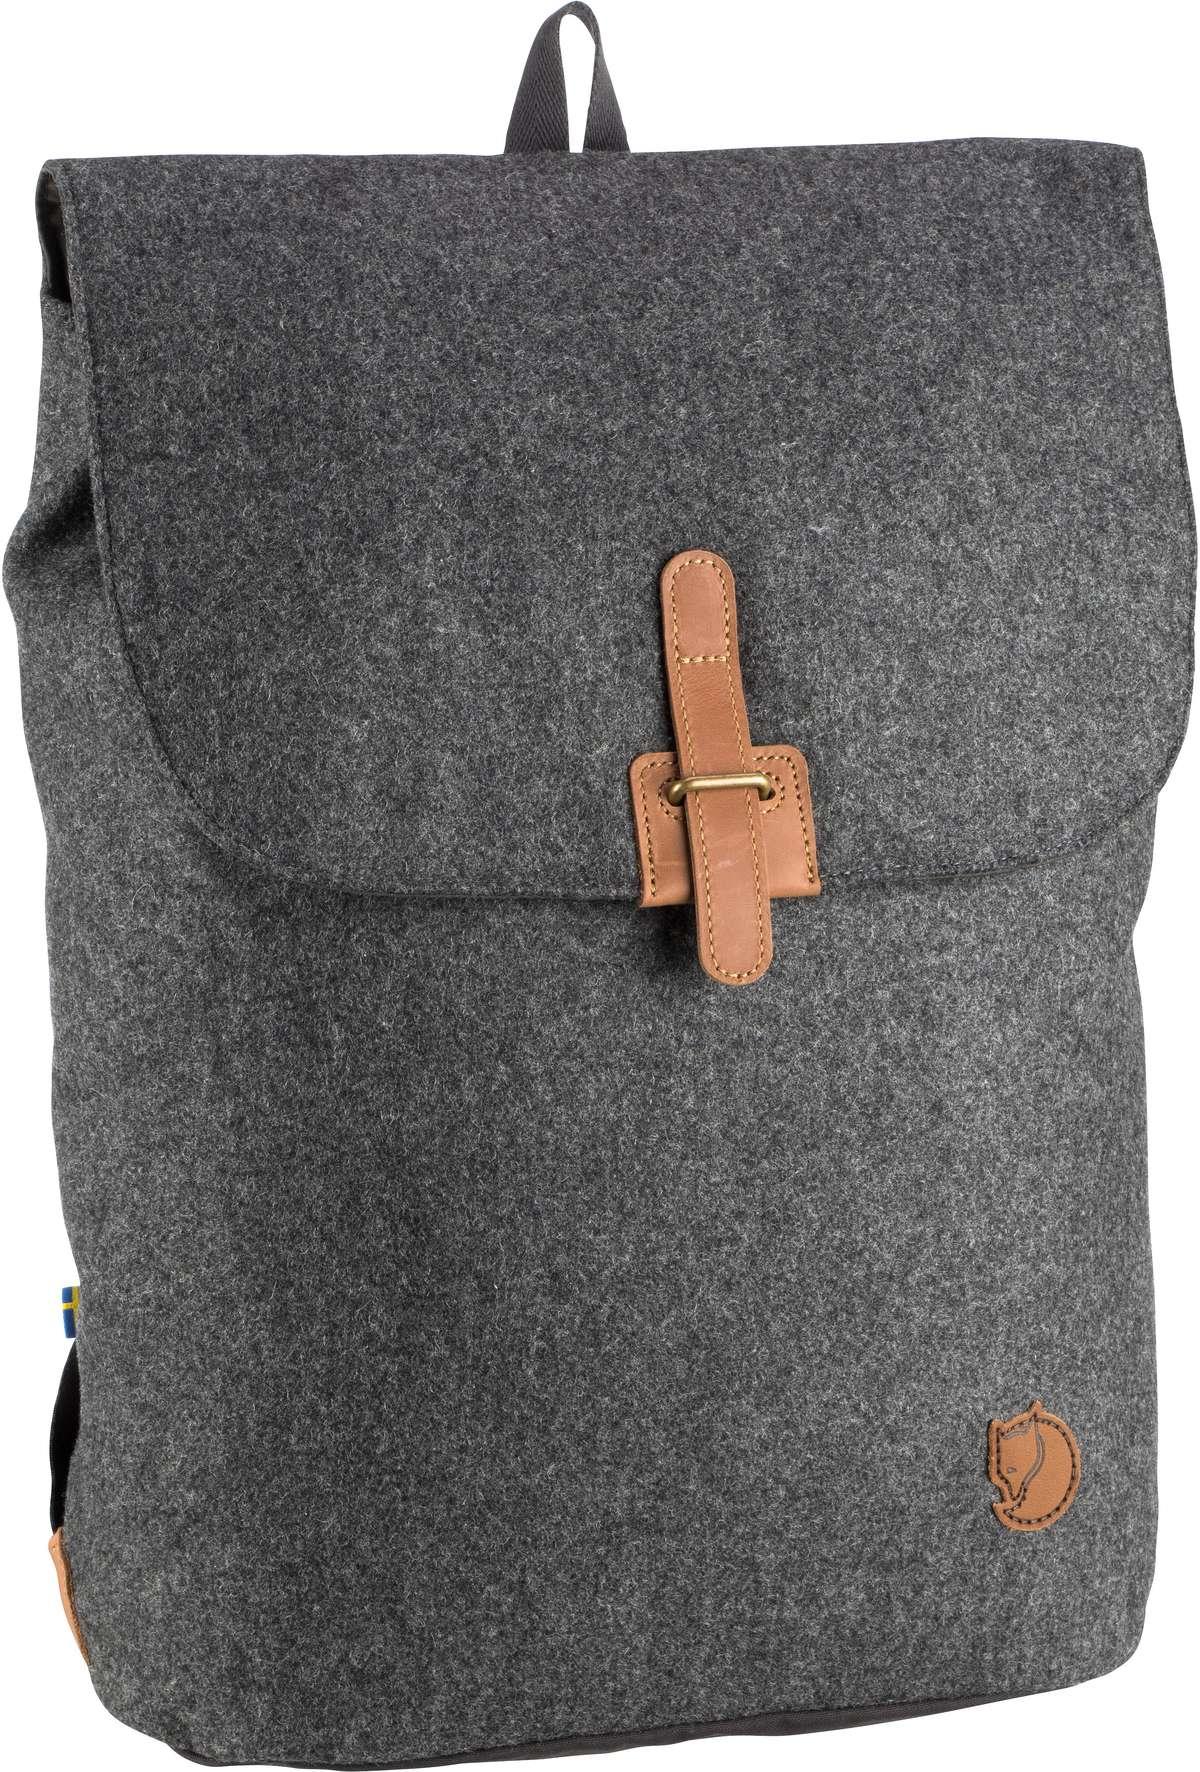 Rucksack / Daypack Norrvage Foldsack Grey (16 Liter)